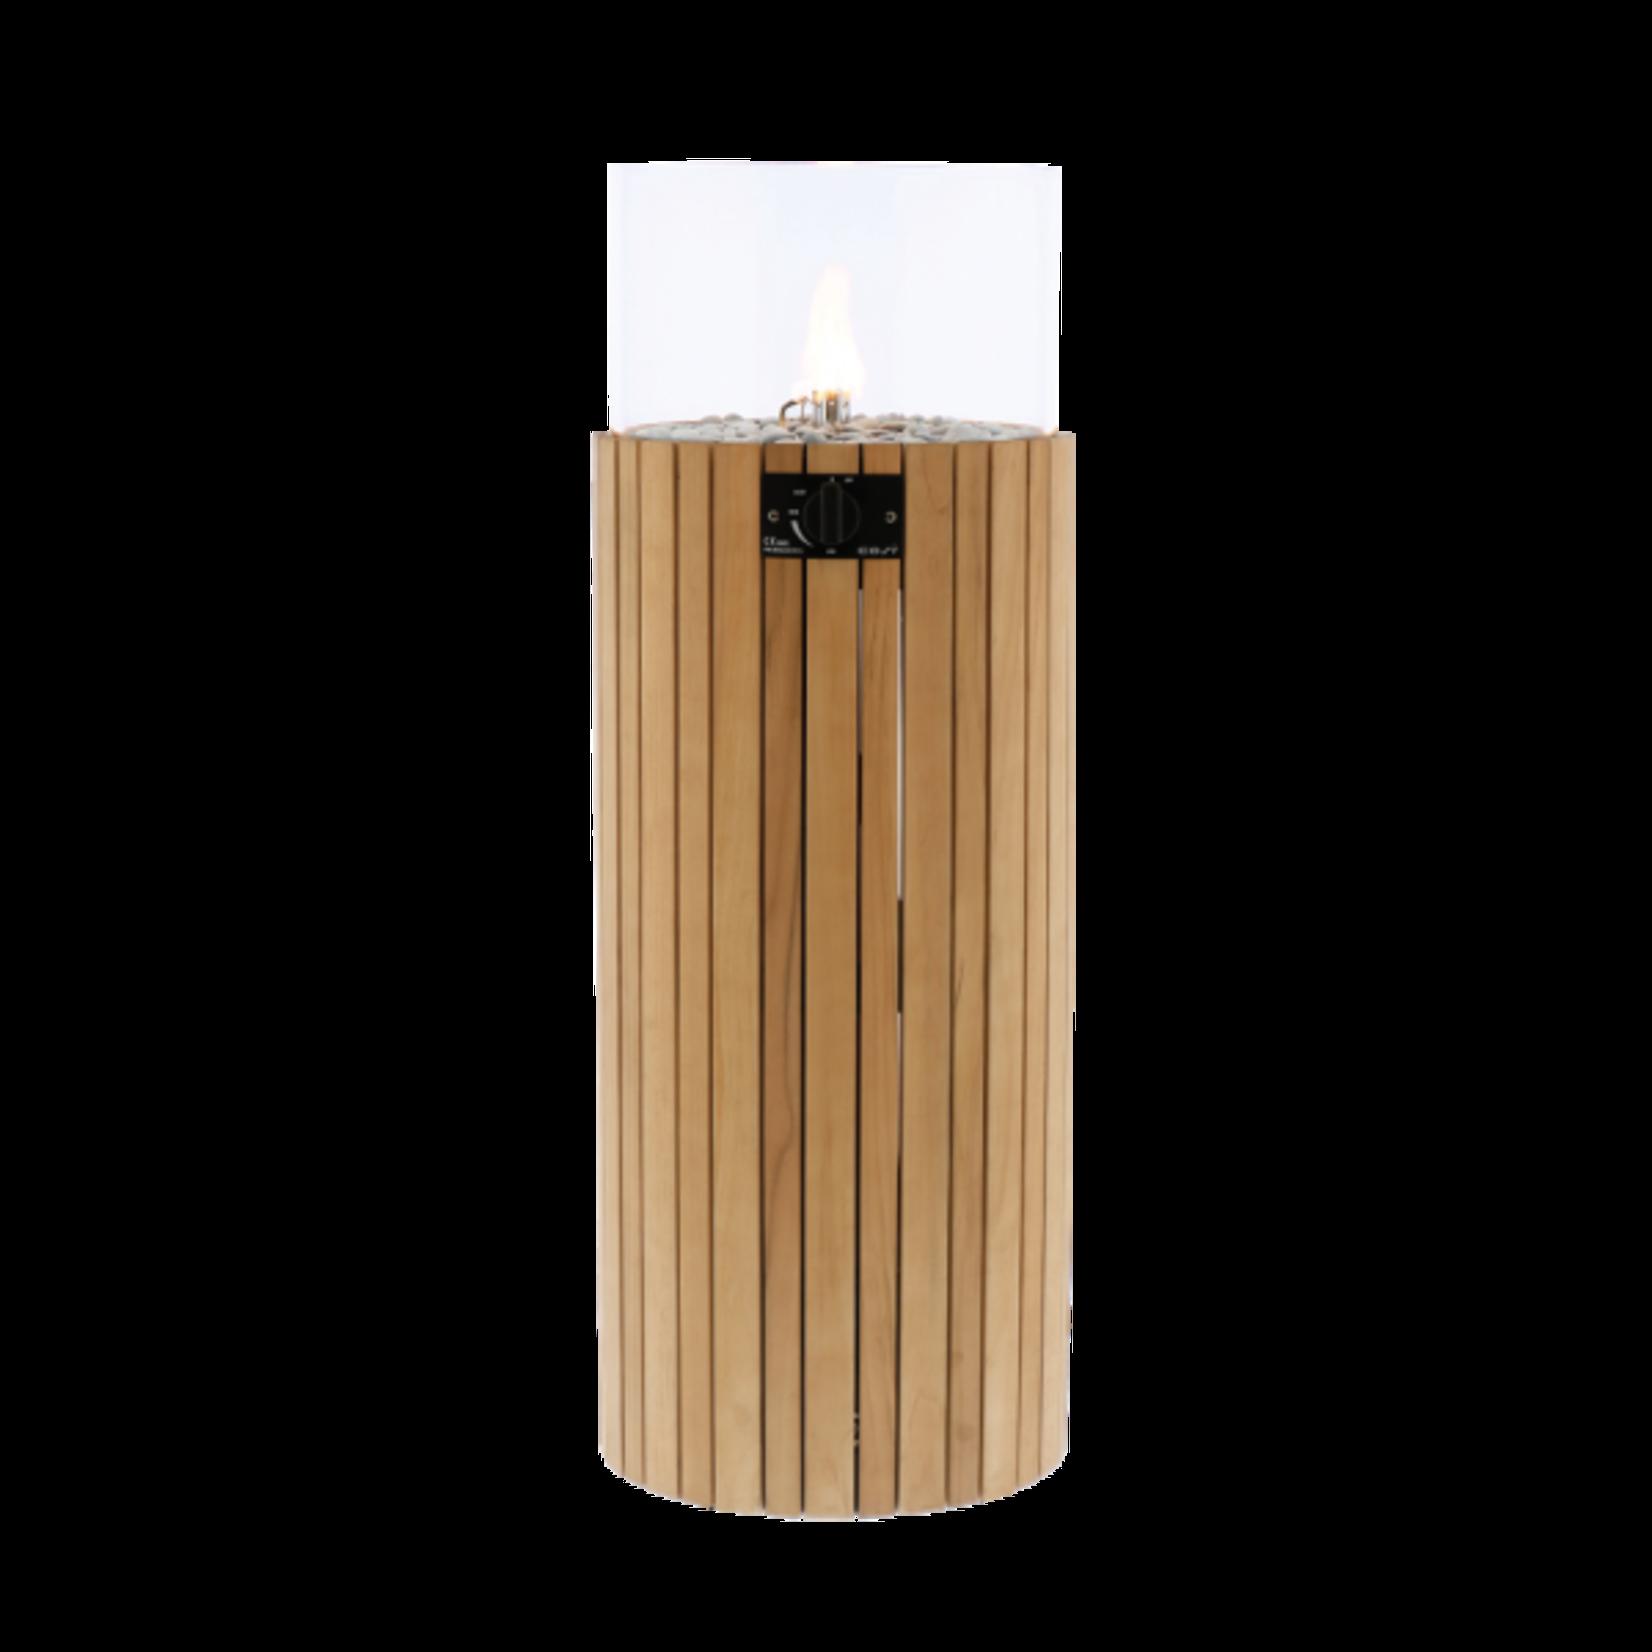 Cosiscoop Pillar Teak Large